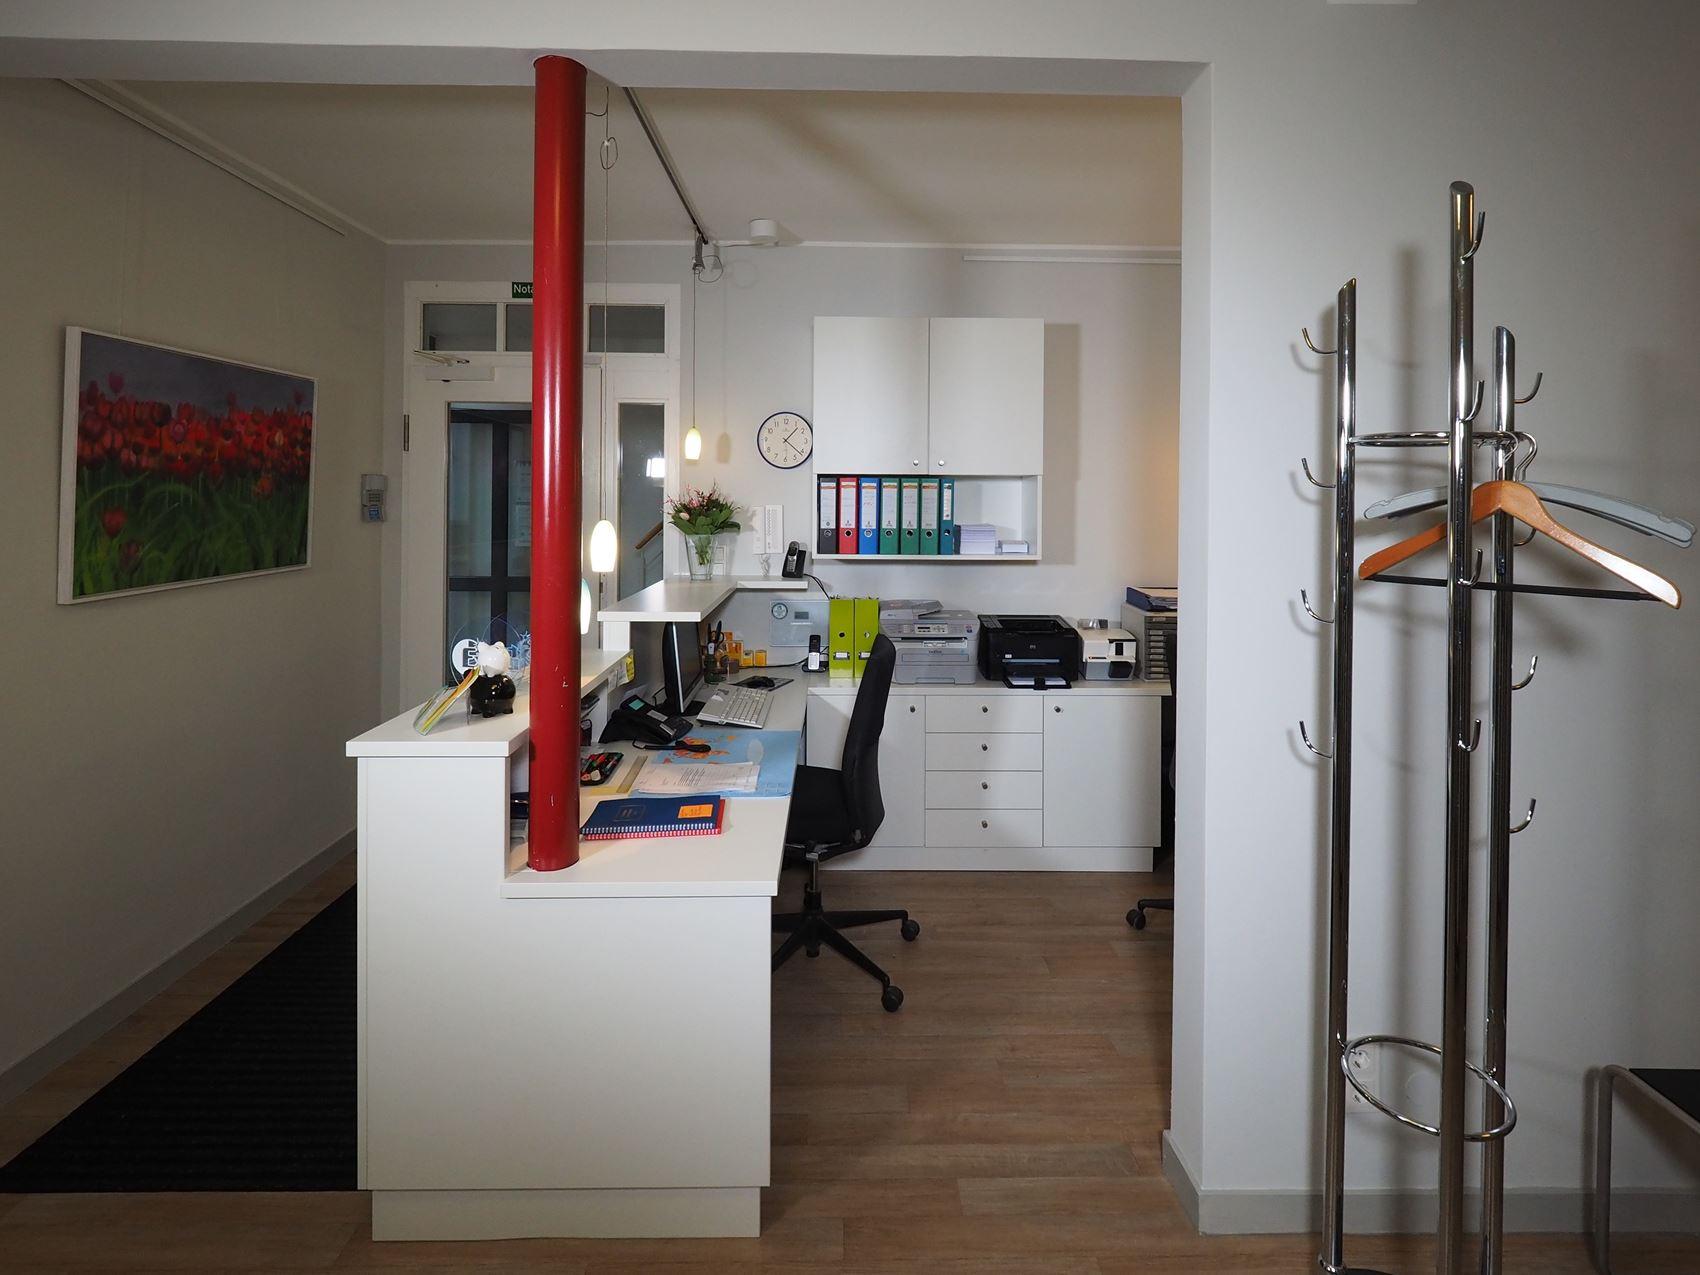 empfangstresen hamburger m bel. Black Bedroom Furniture Sets. Home Design Ideas